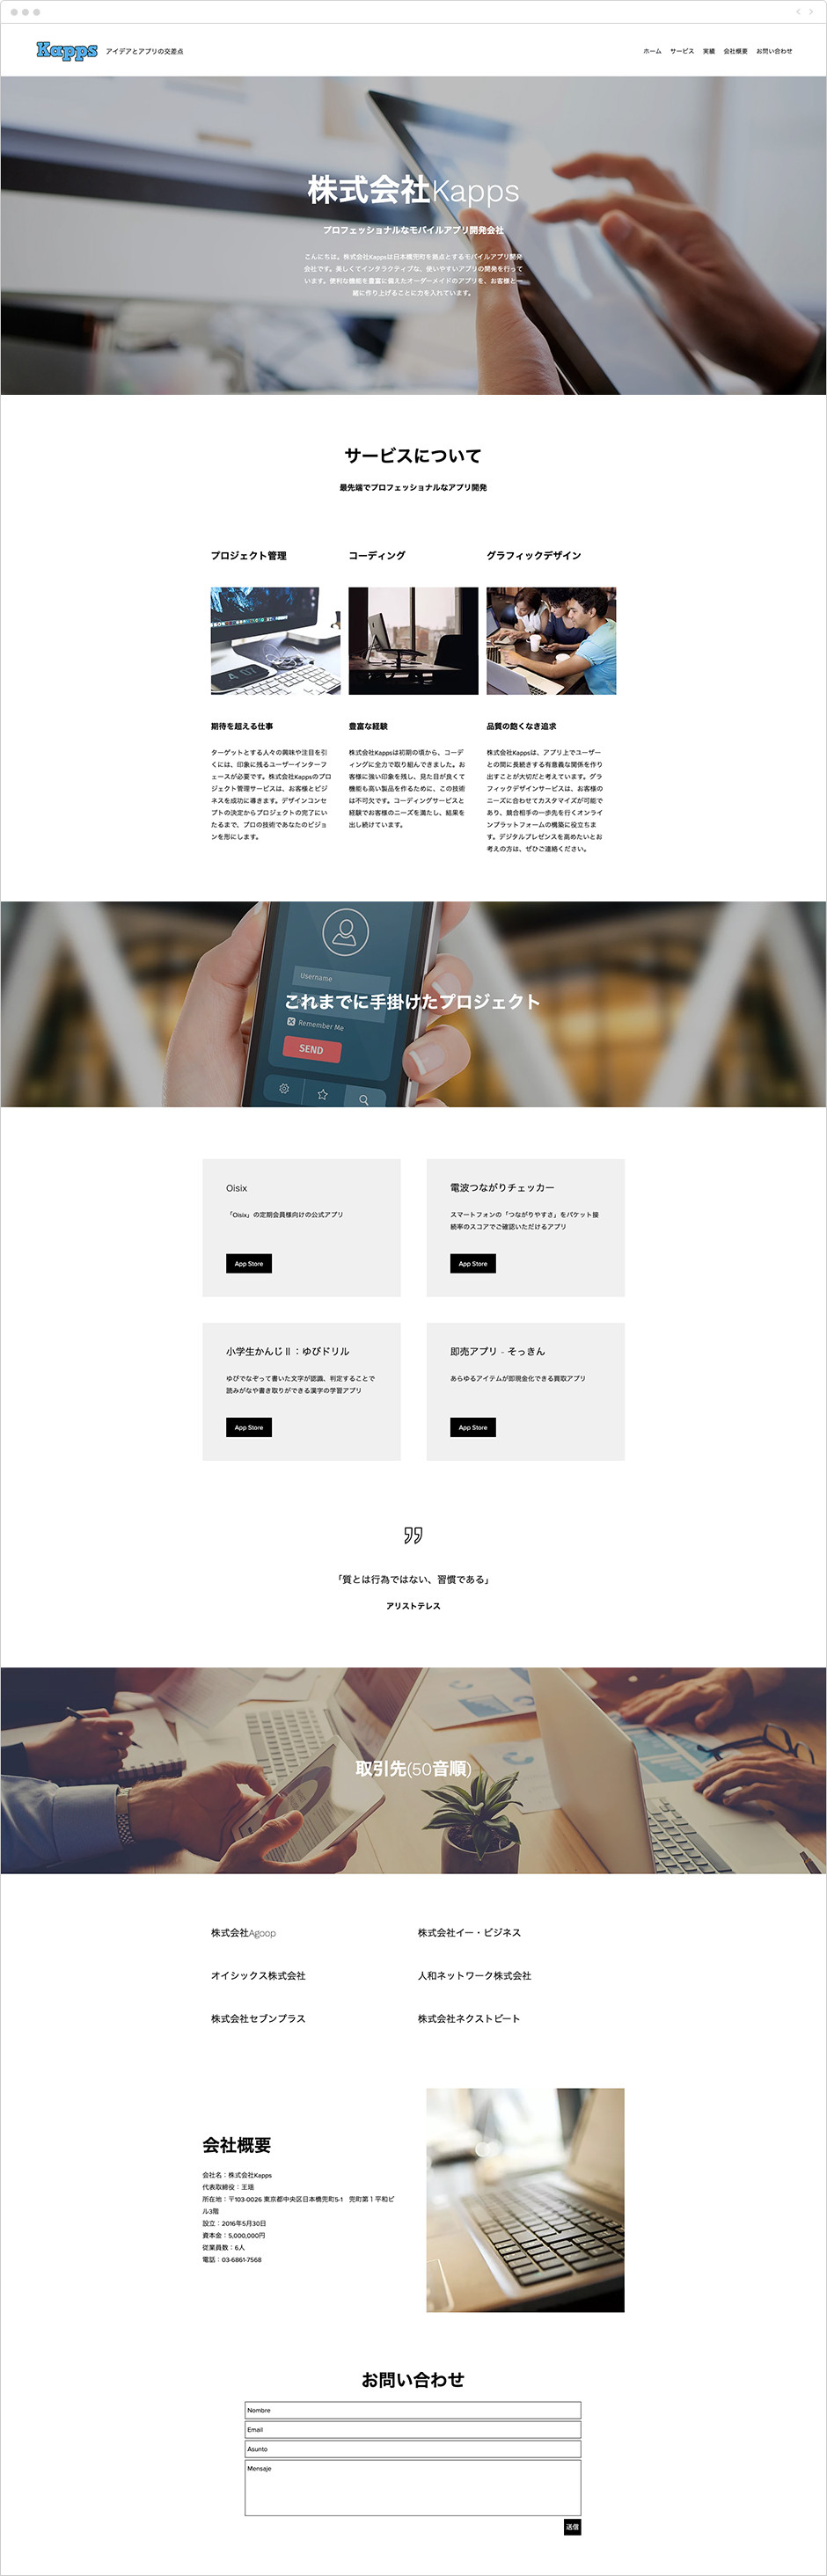 Wix ADI サイト事例 株式会社Kapps